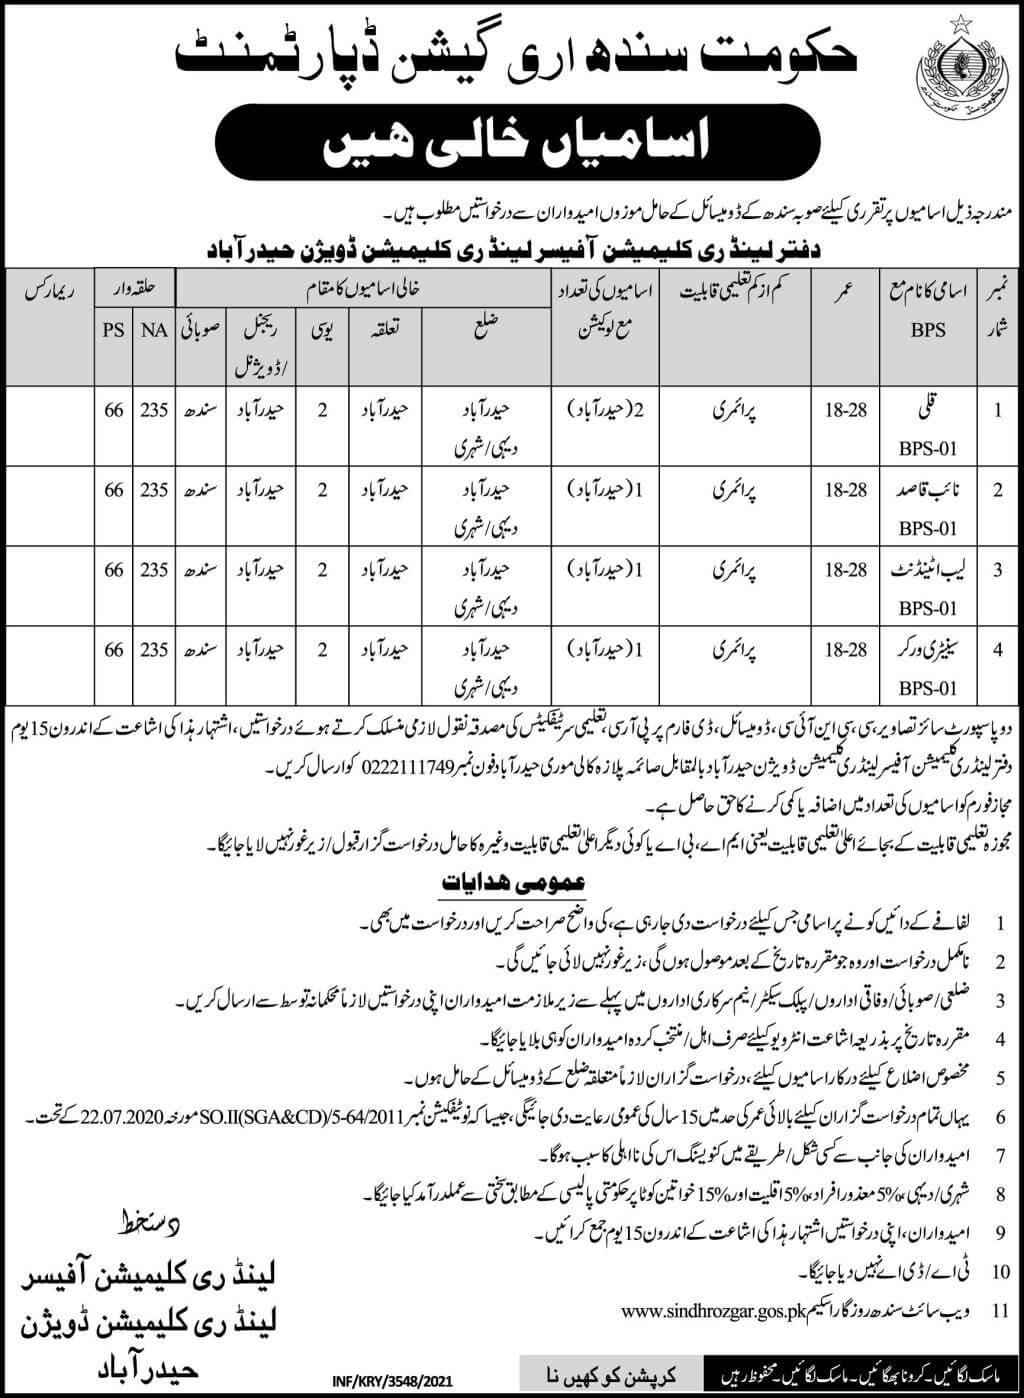 Sindh Govt Jobs Today 2021